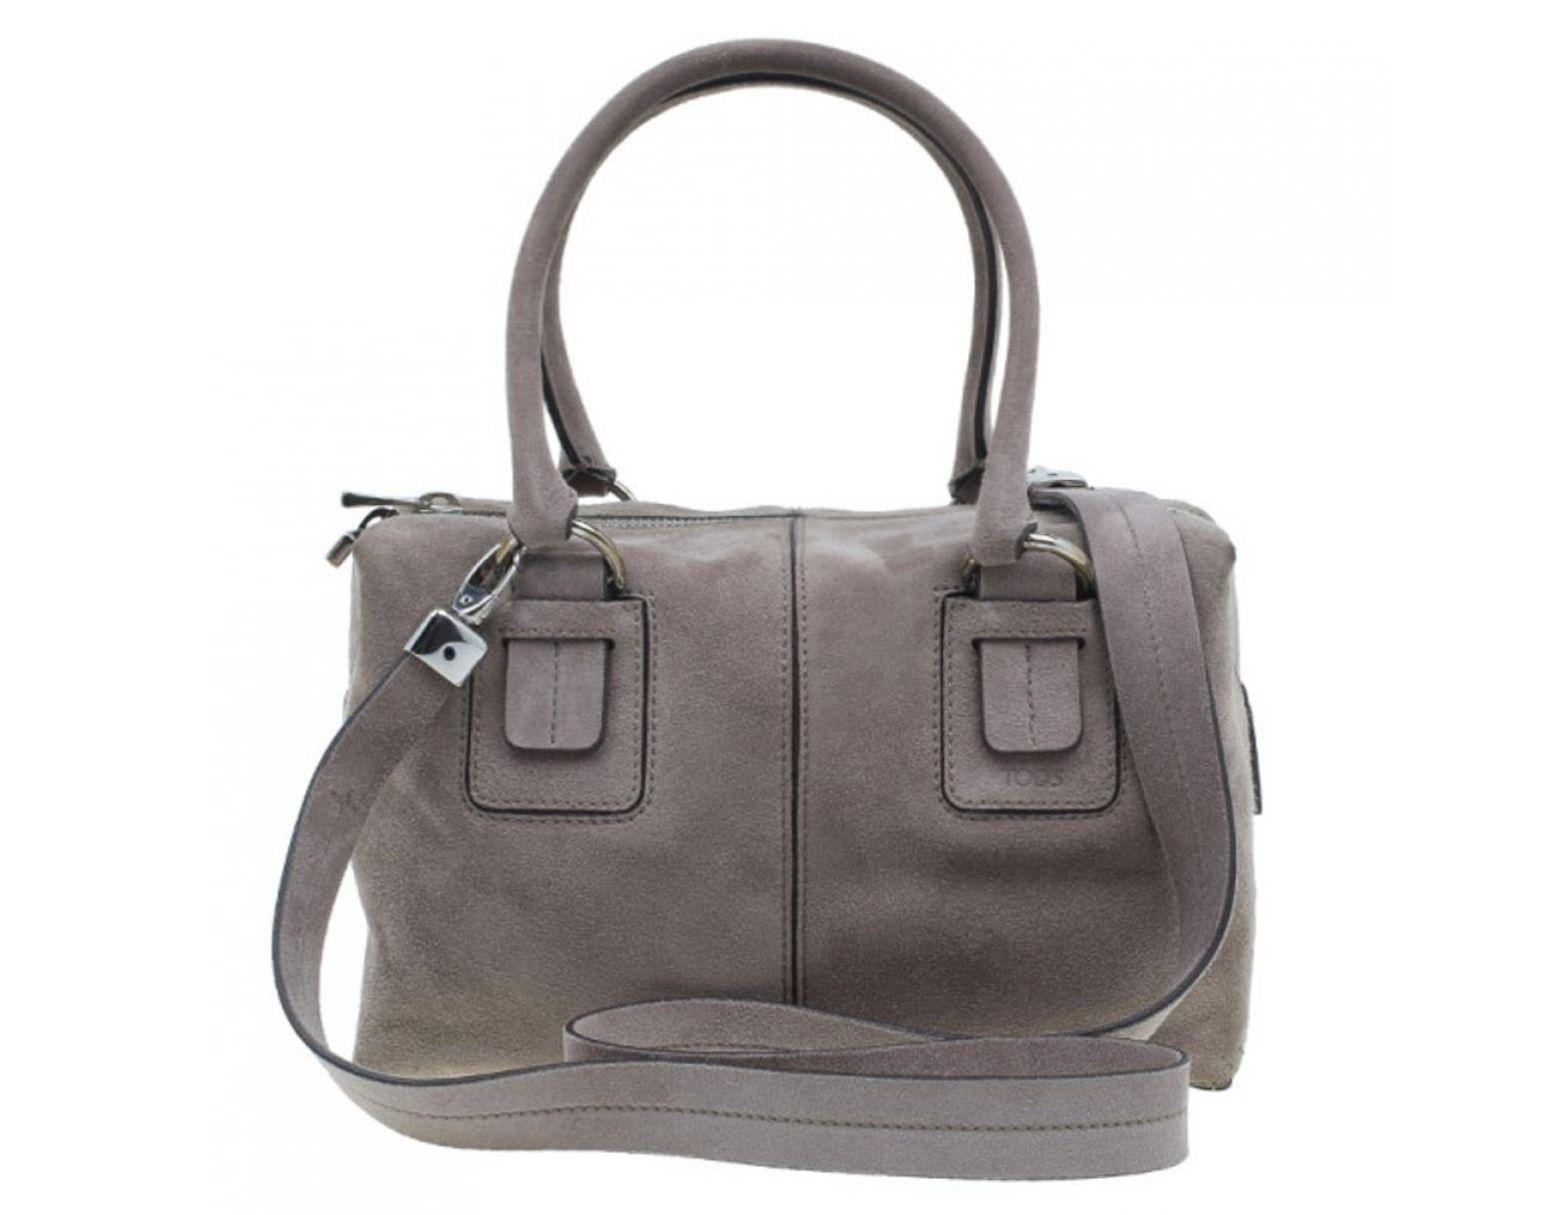 05111609cf2 Tod's Pre-owned Grey Suede Handbags in Gray - Lyst